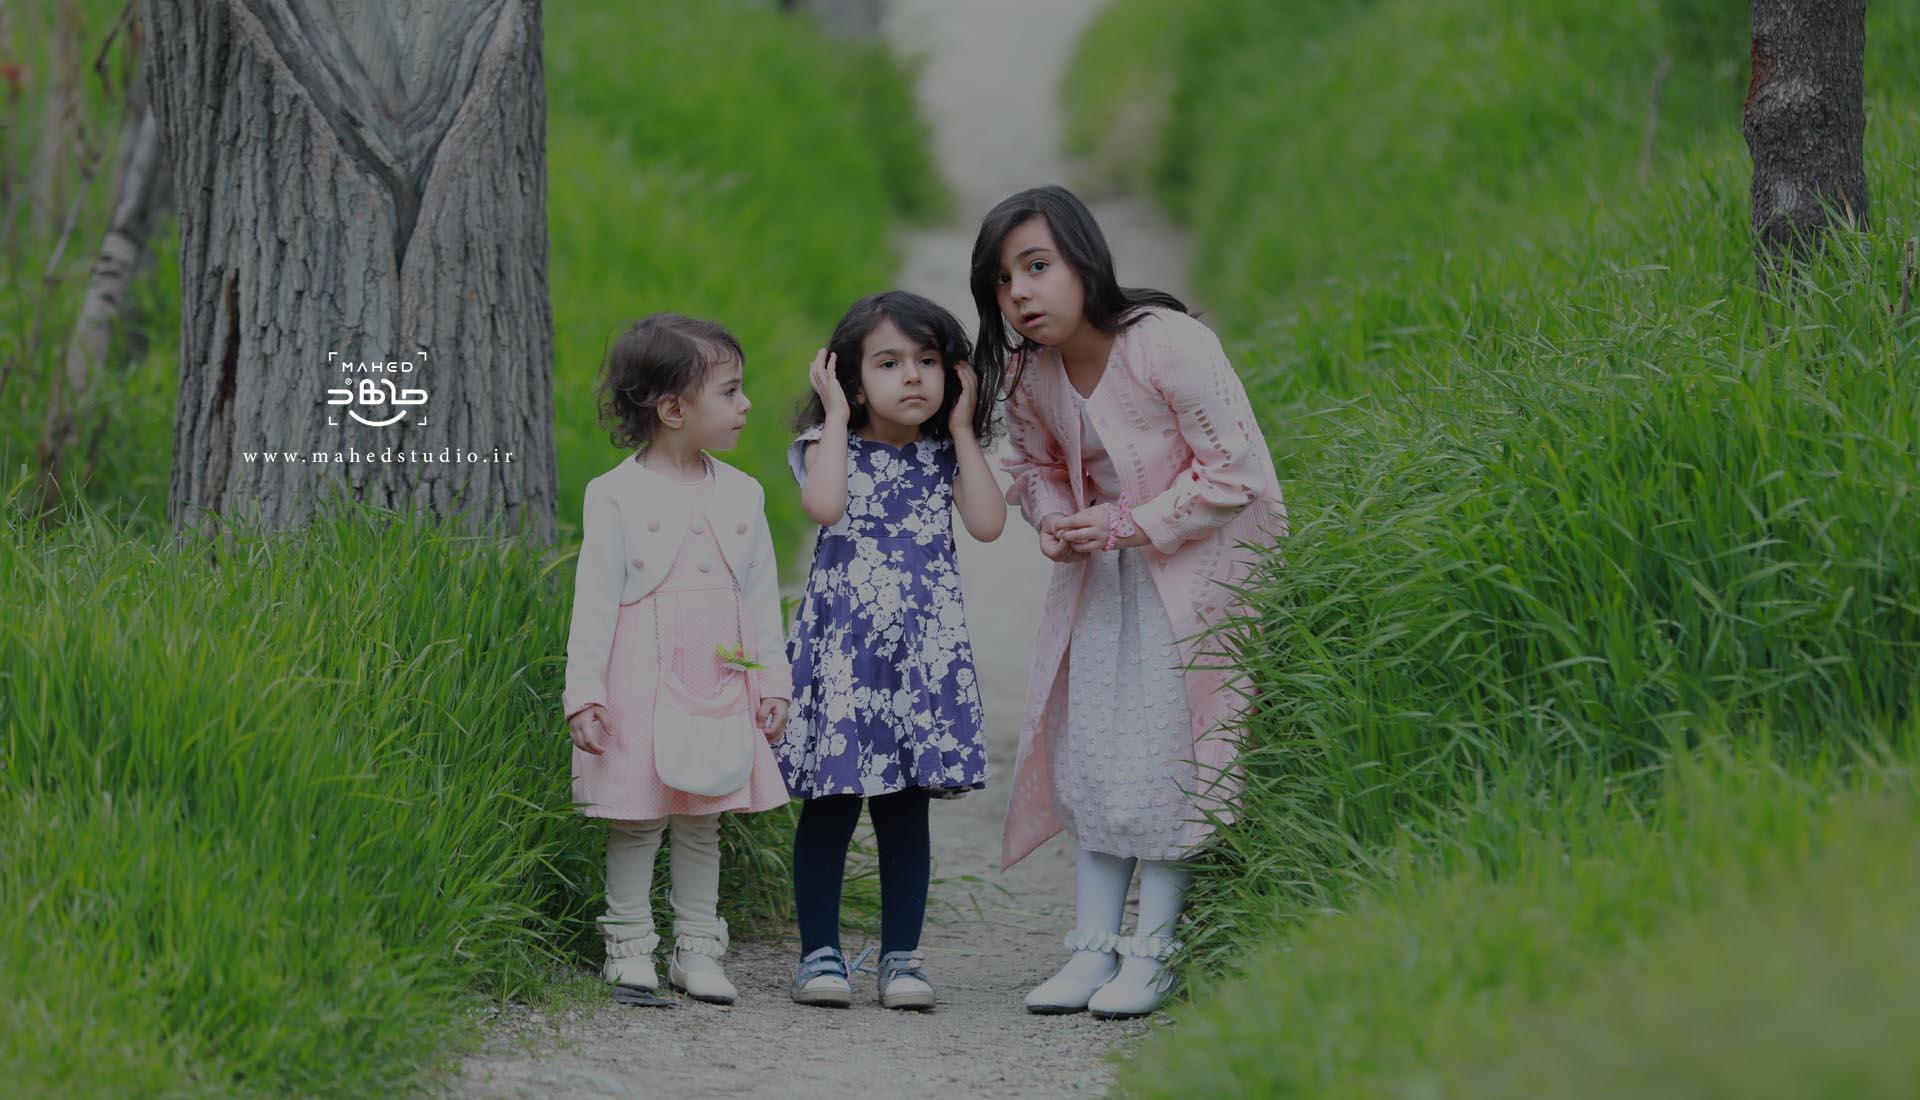 عکاسی کودکان تمدن ساز